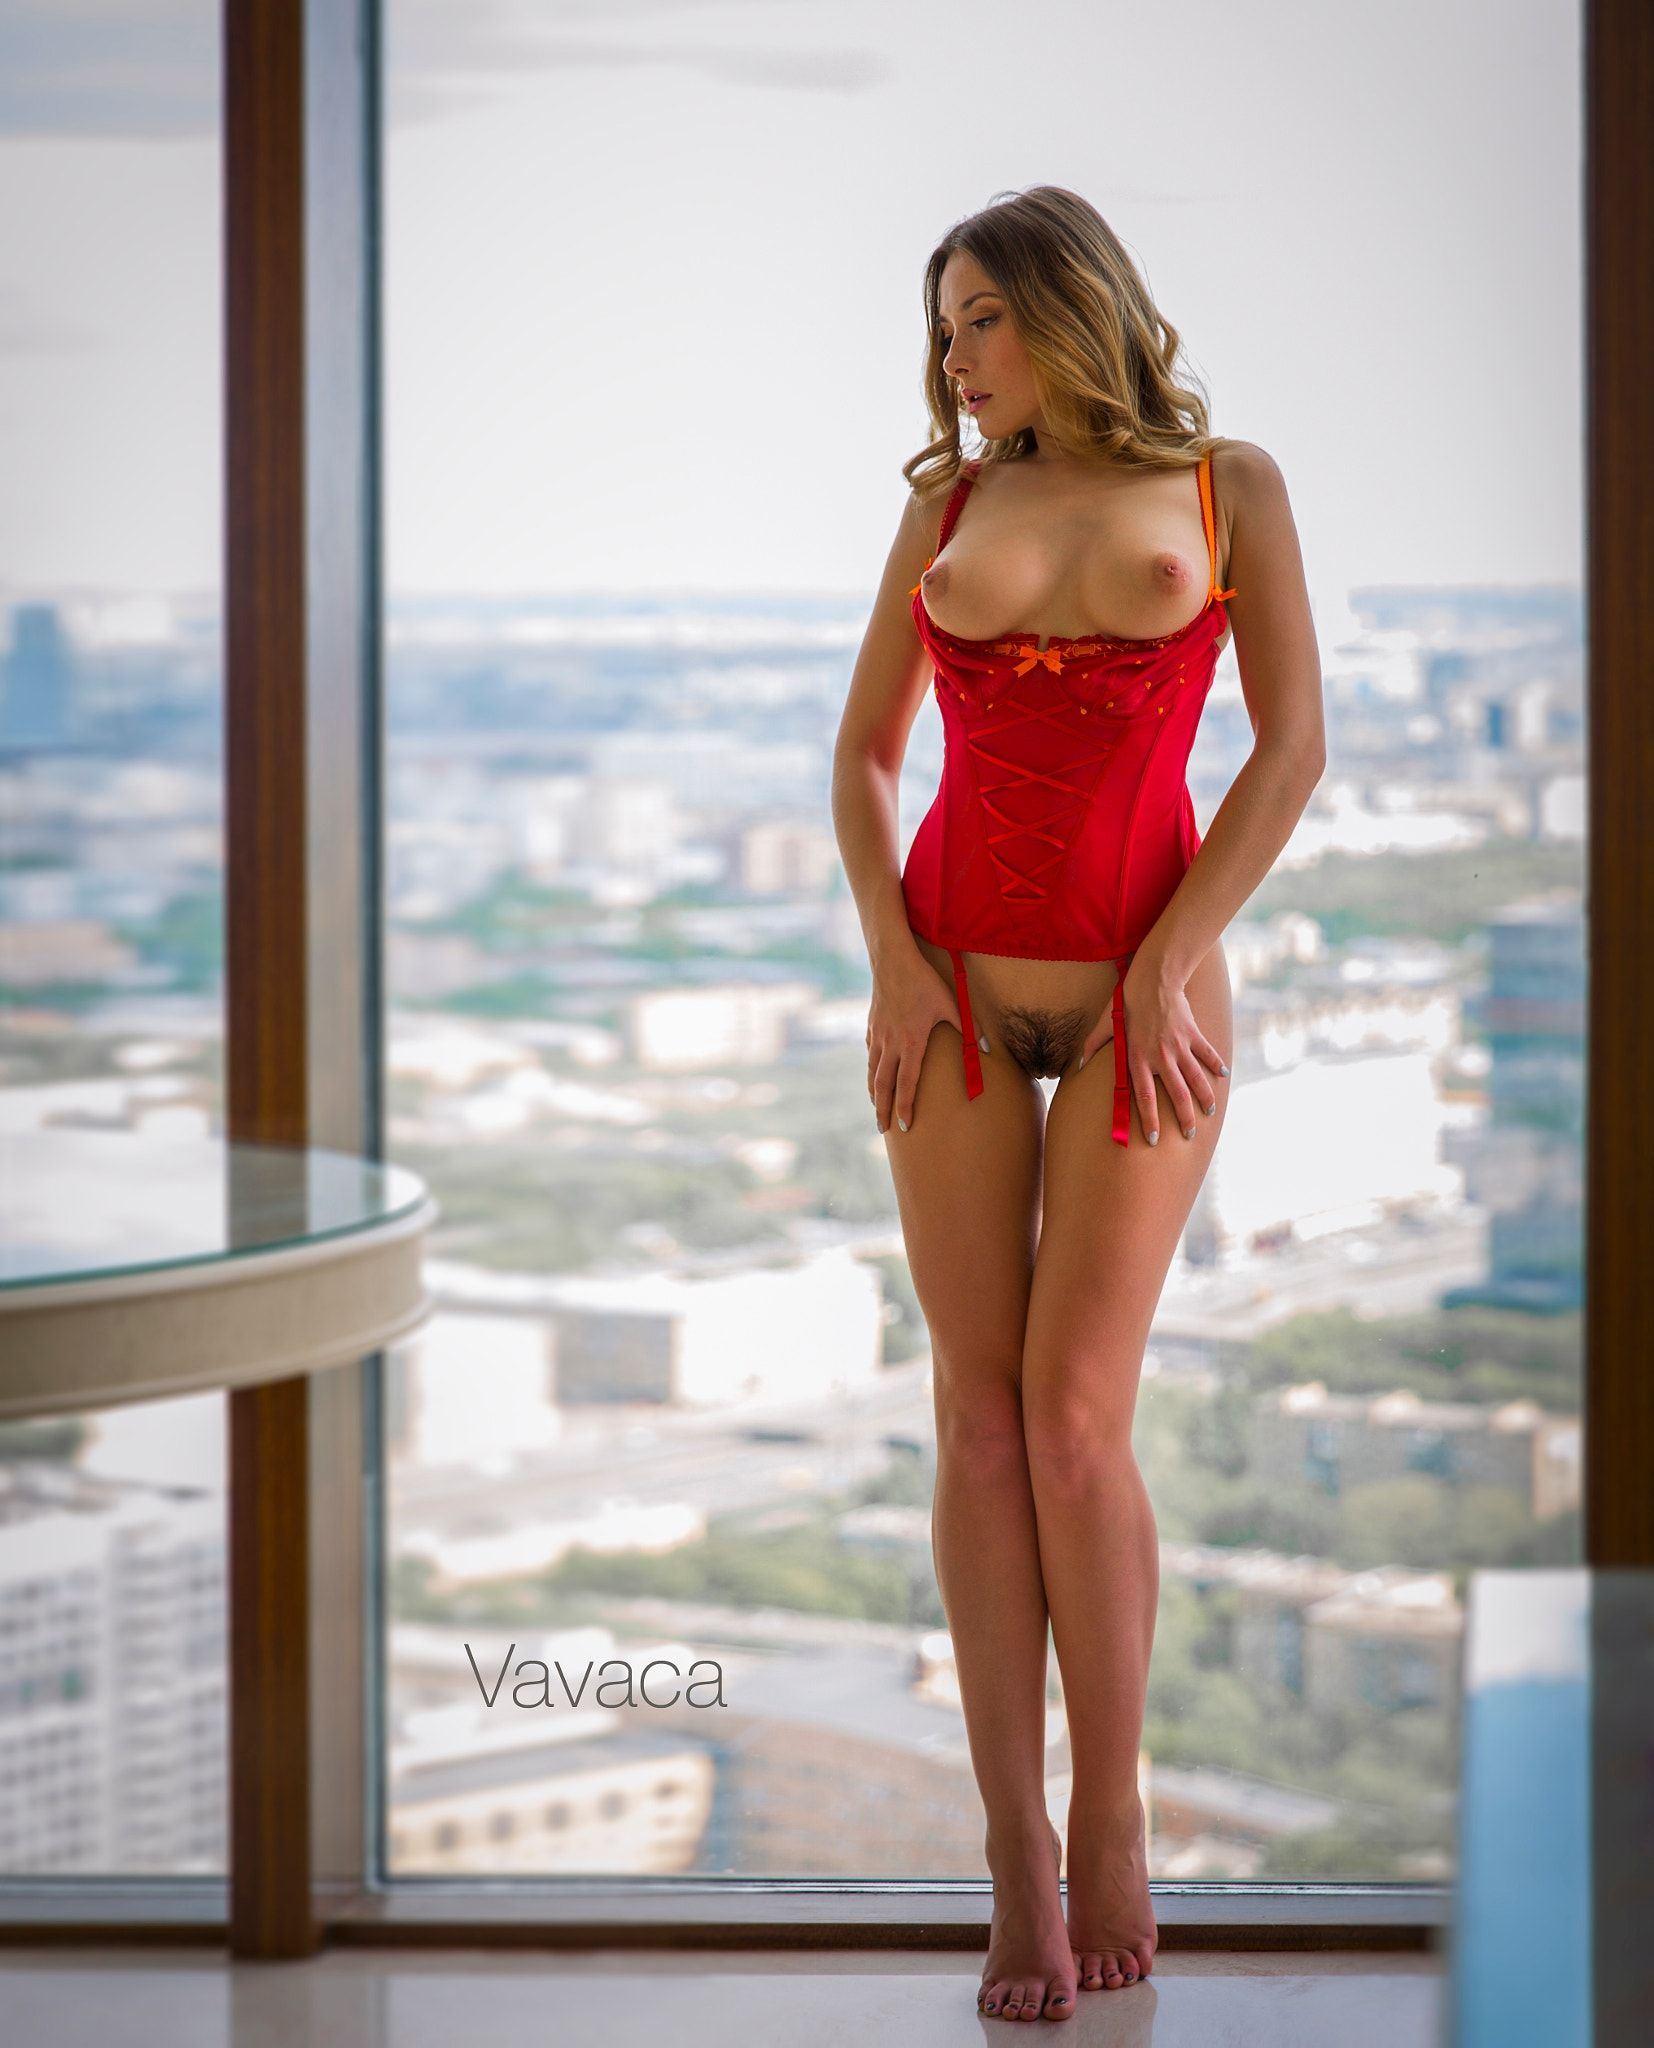 9a901c8f31de4 above the city 5 - Olga Kobzar